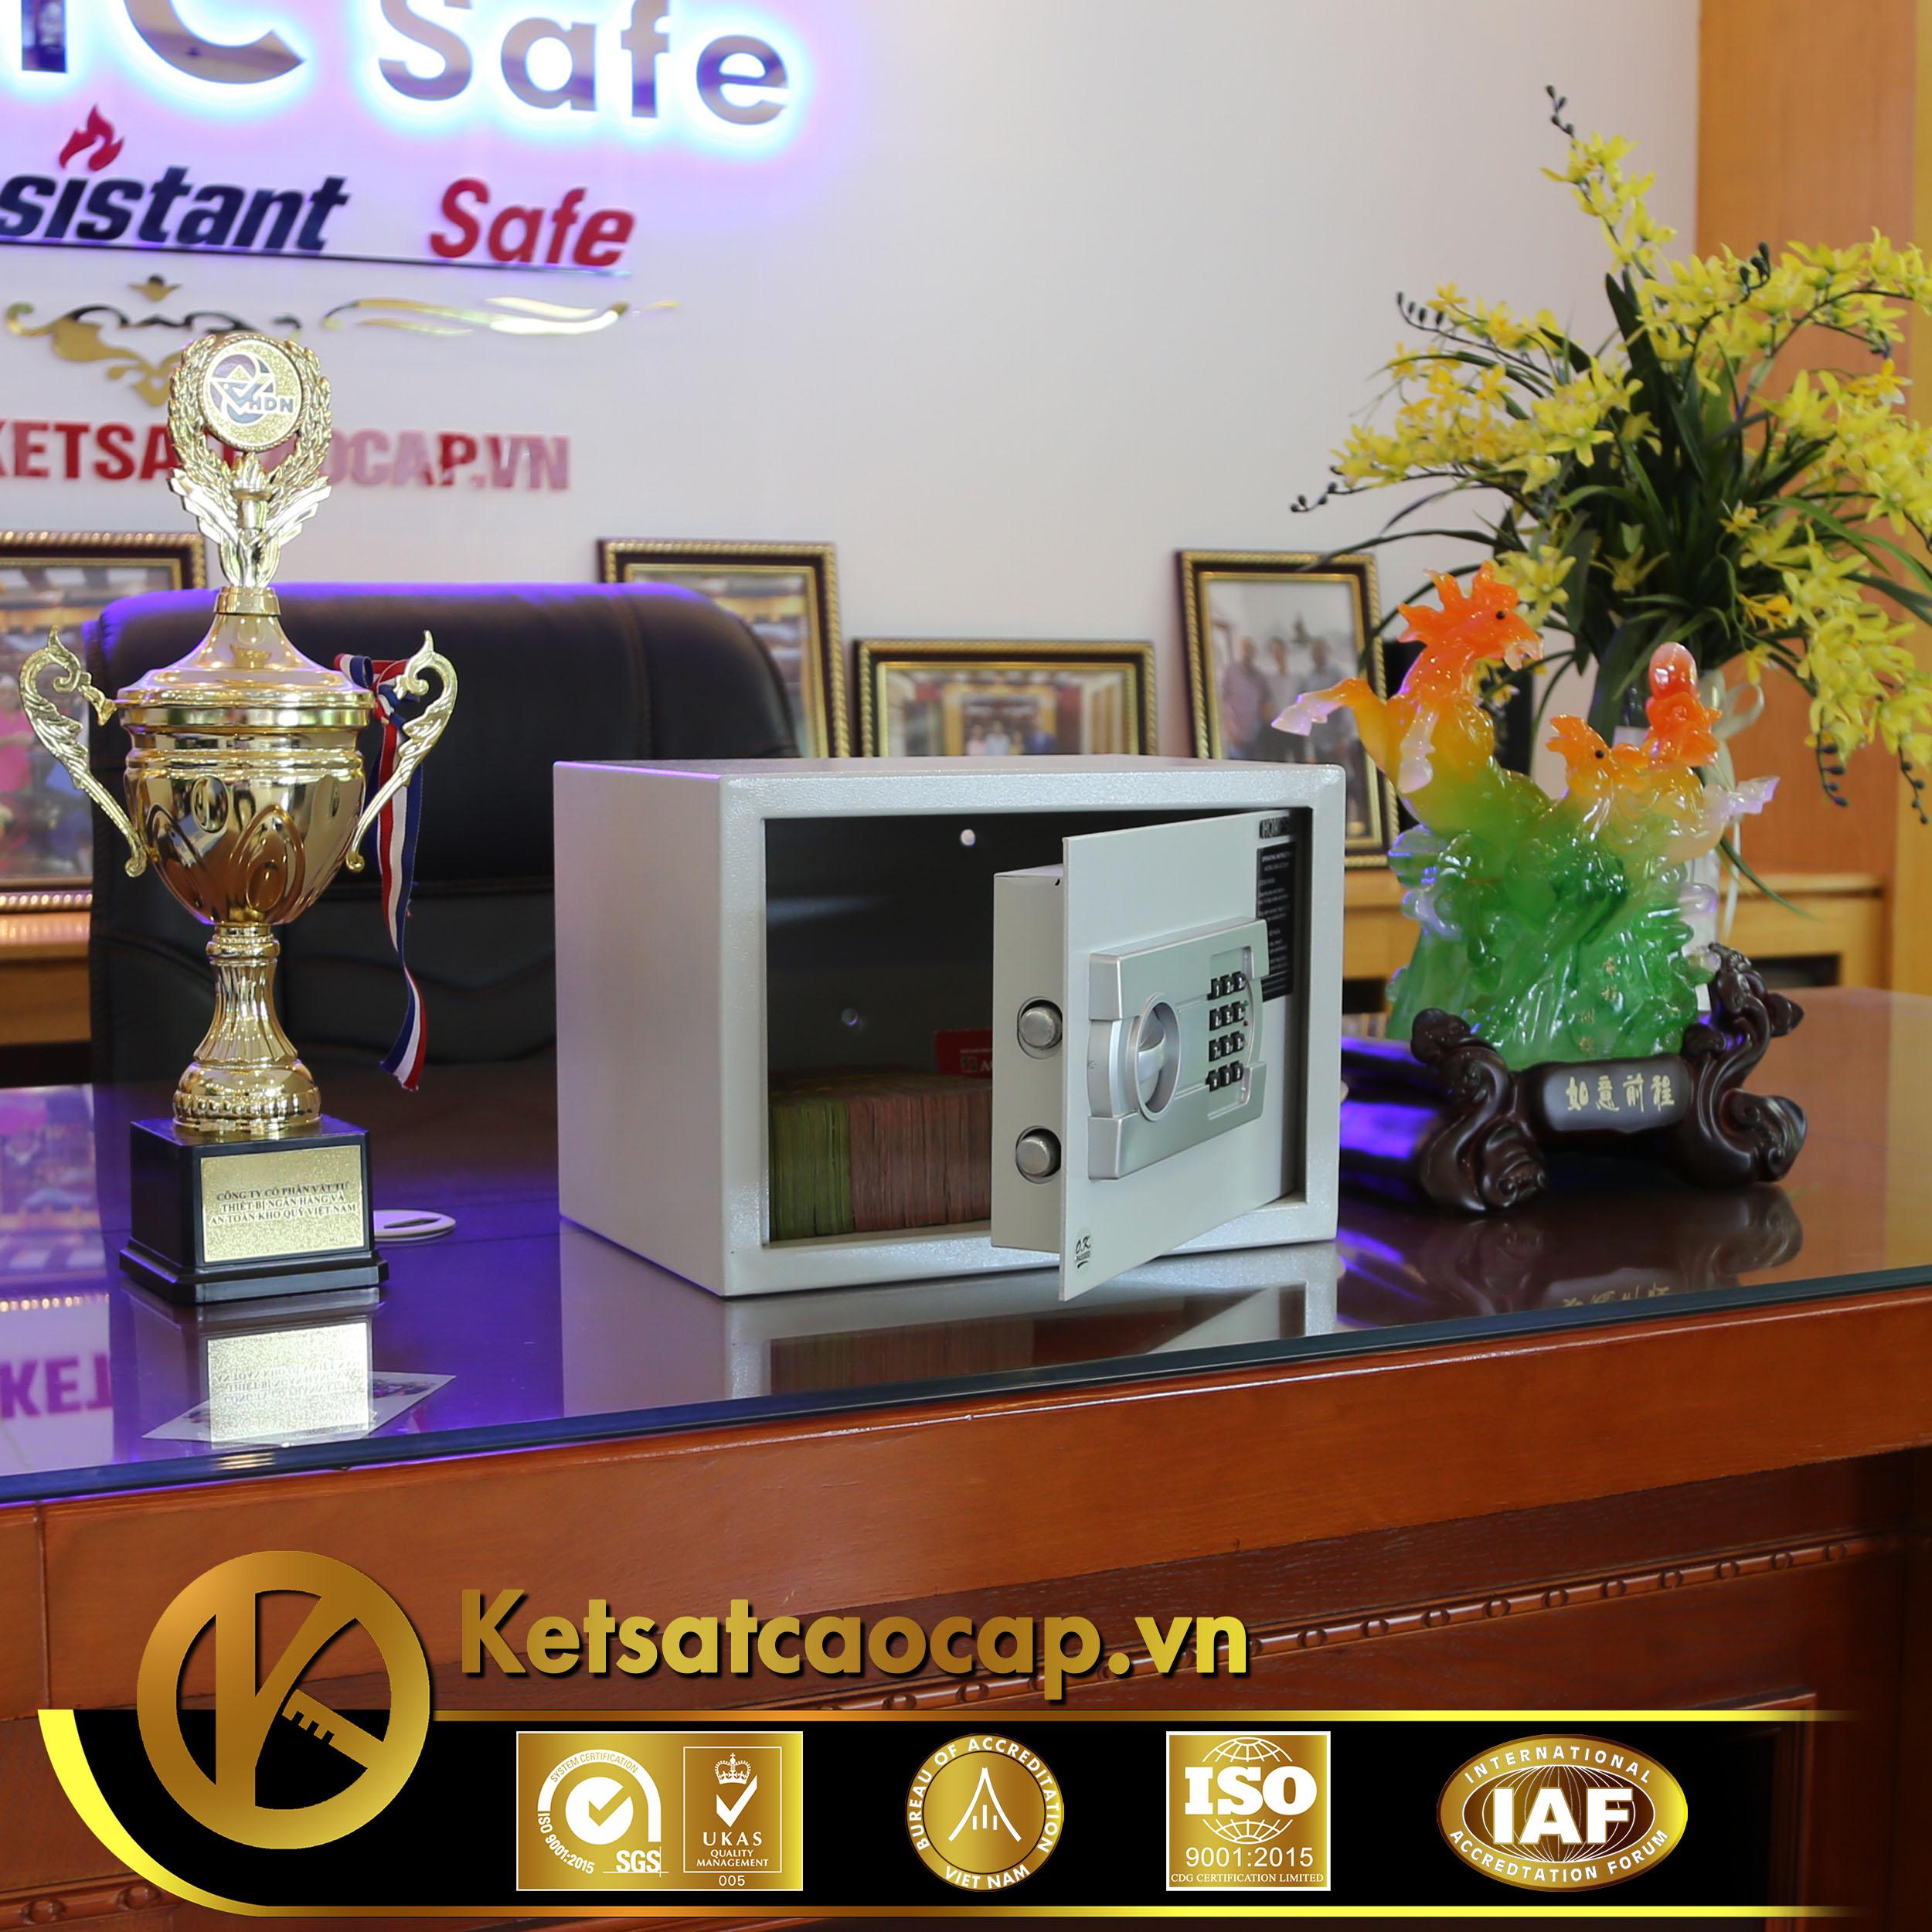 Két sắt khách sạn cao cấp KS25-ACT